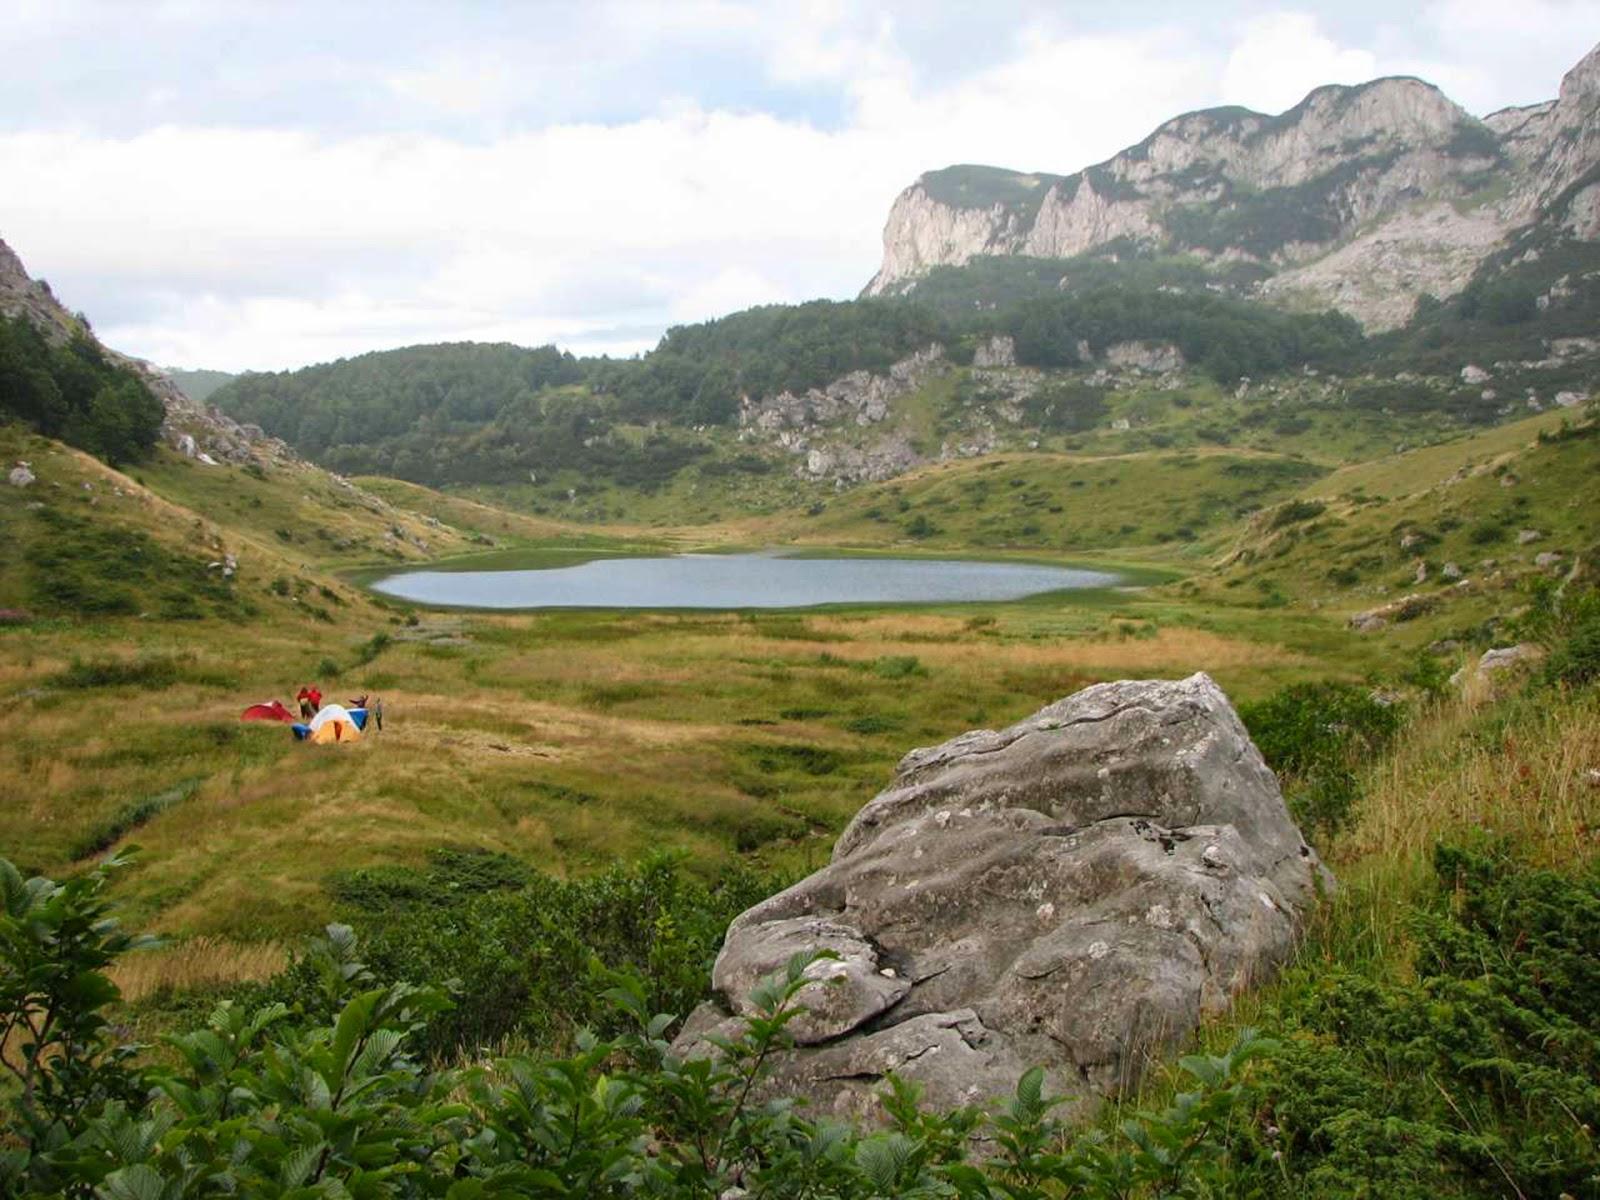 Full HD Lake Green Mountains Nature Desktop Backgrounds Image Wallpaper Free